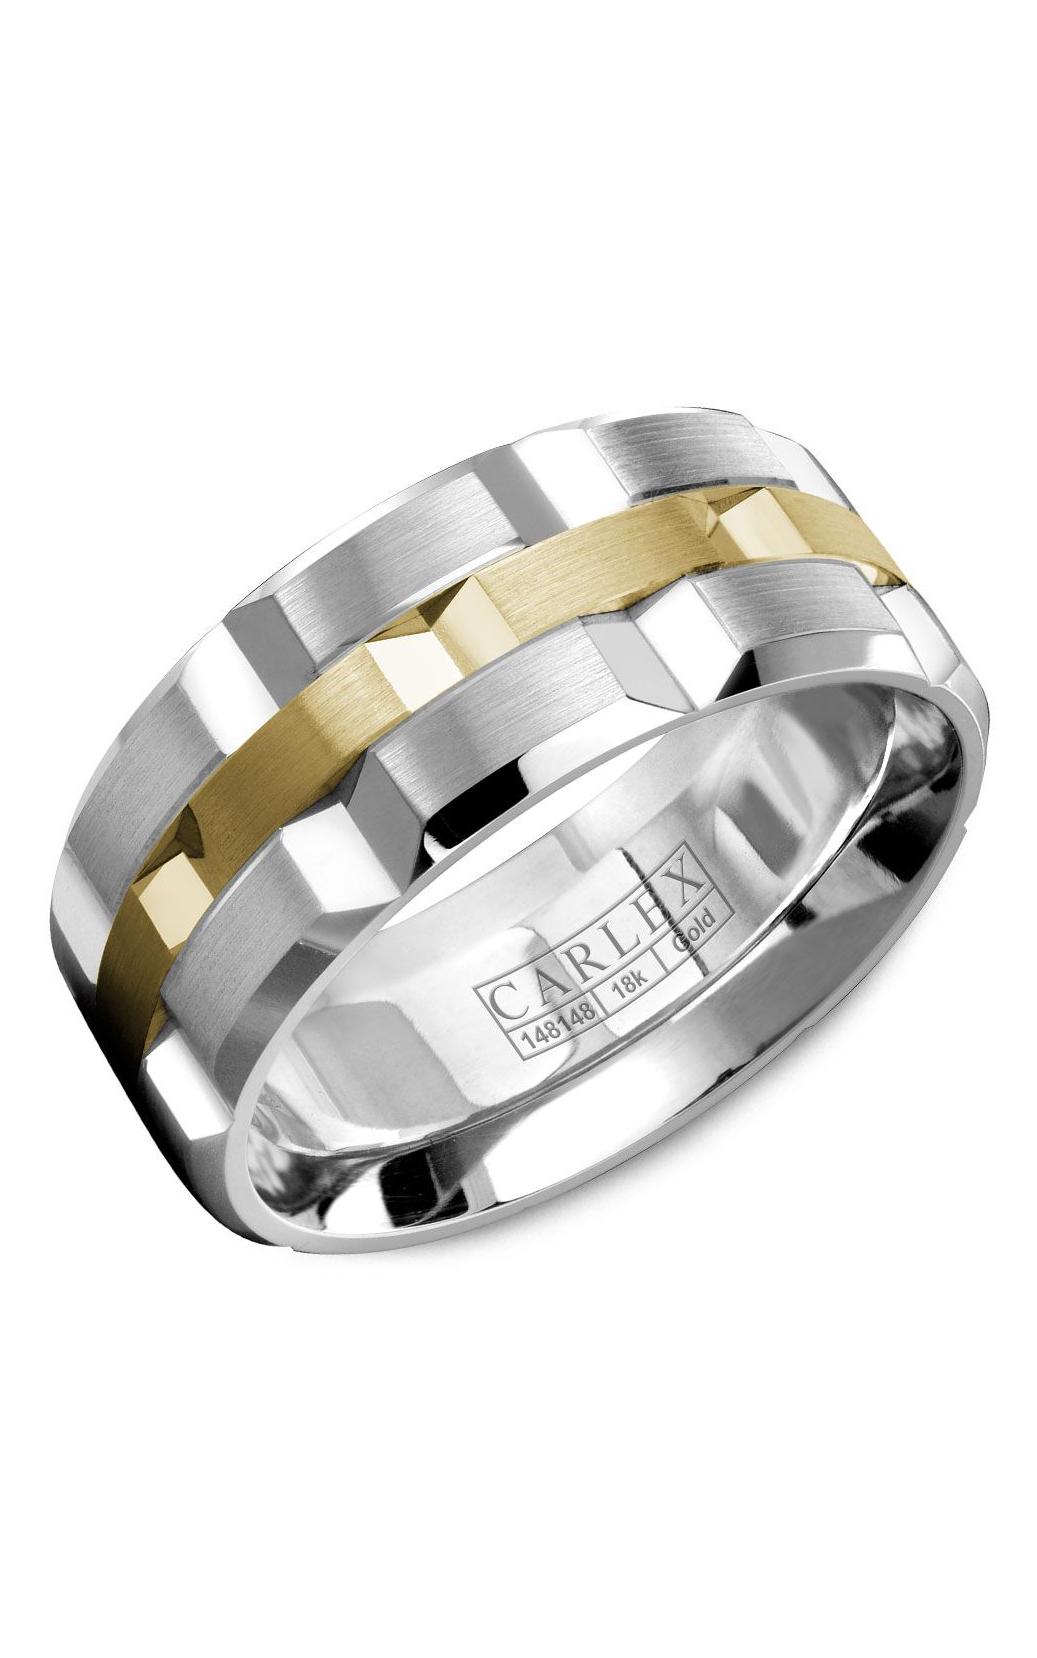 Carlex G1 Men's Wedding Band WB-9288 product image